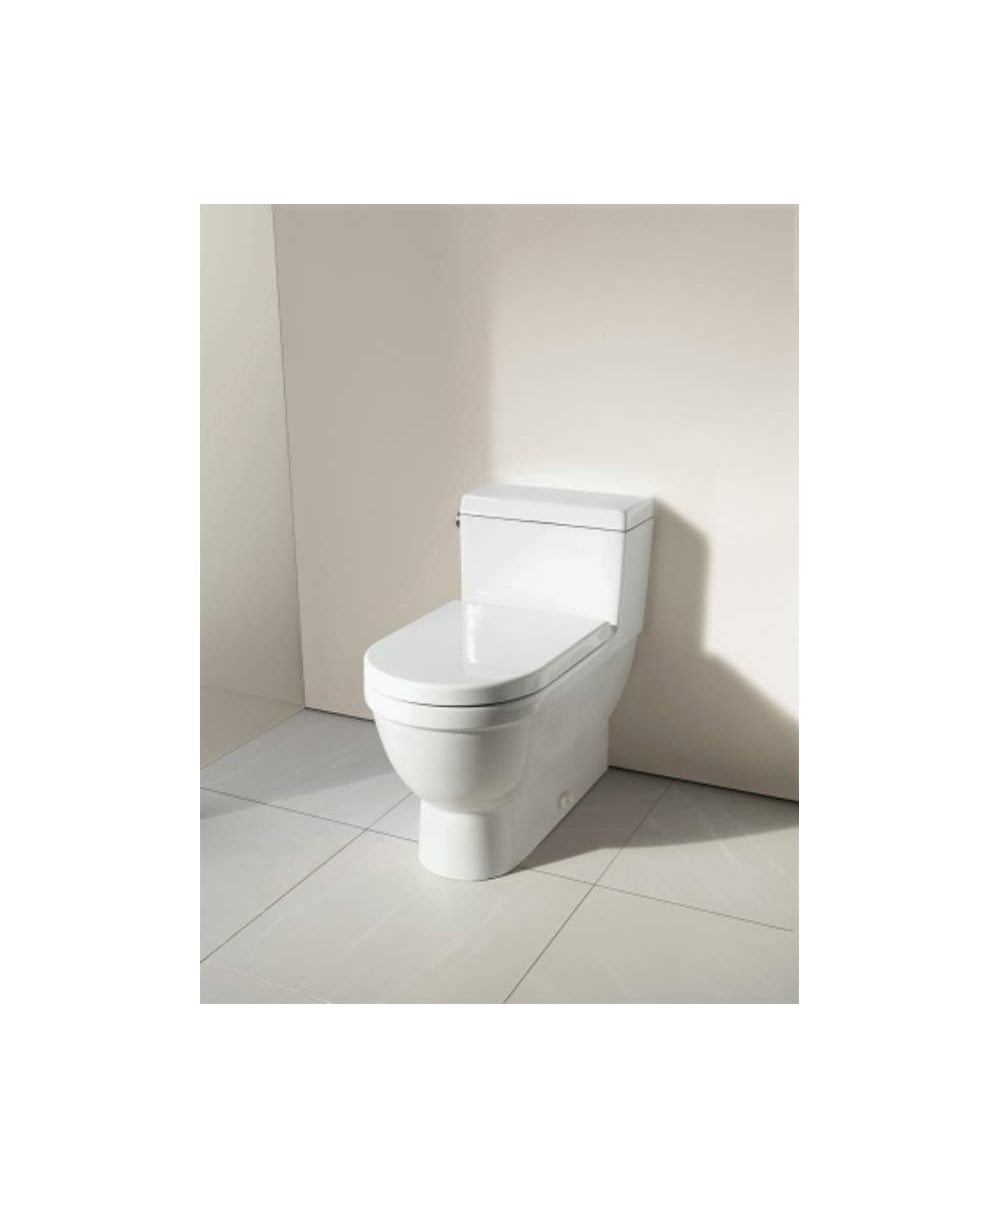 3 / Starck 2 Elongated Toilet Seat